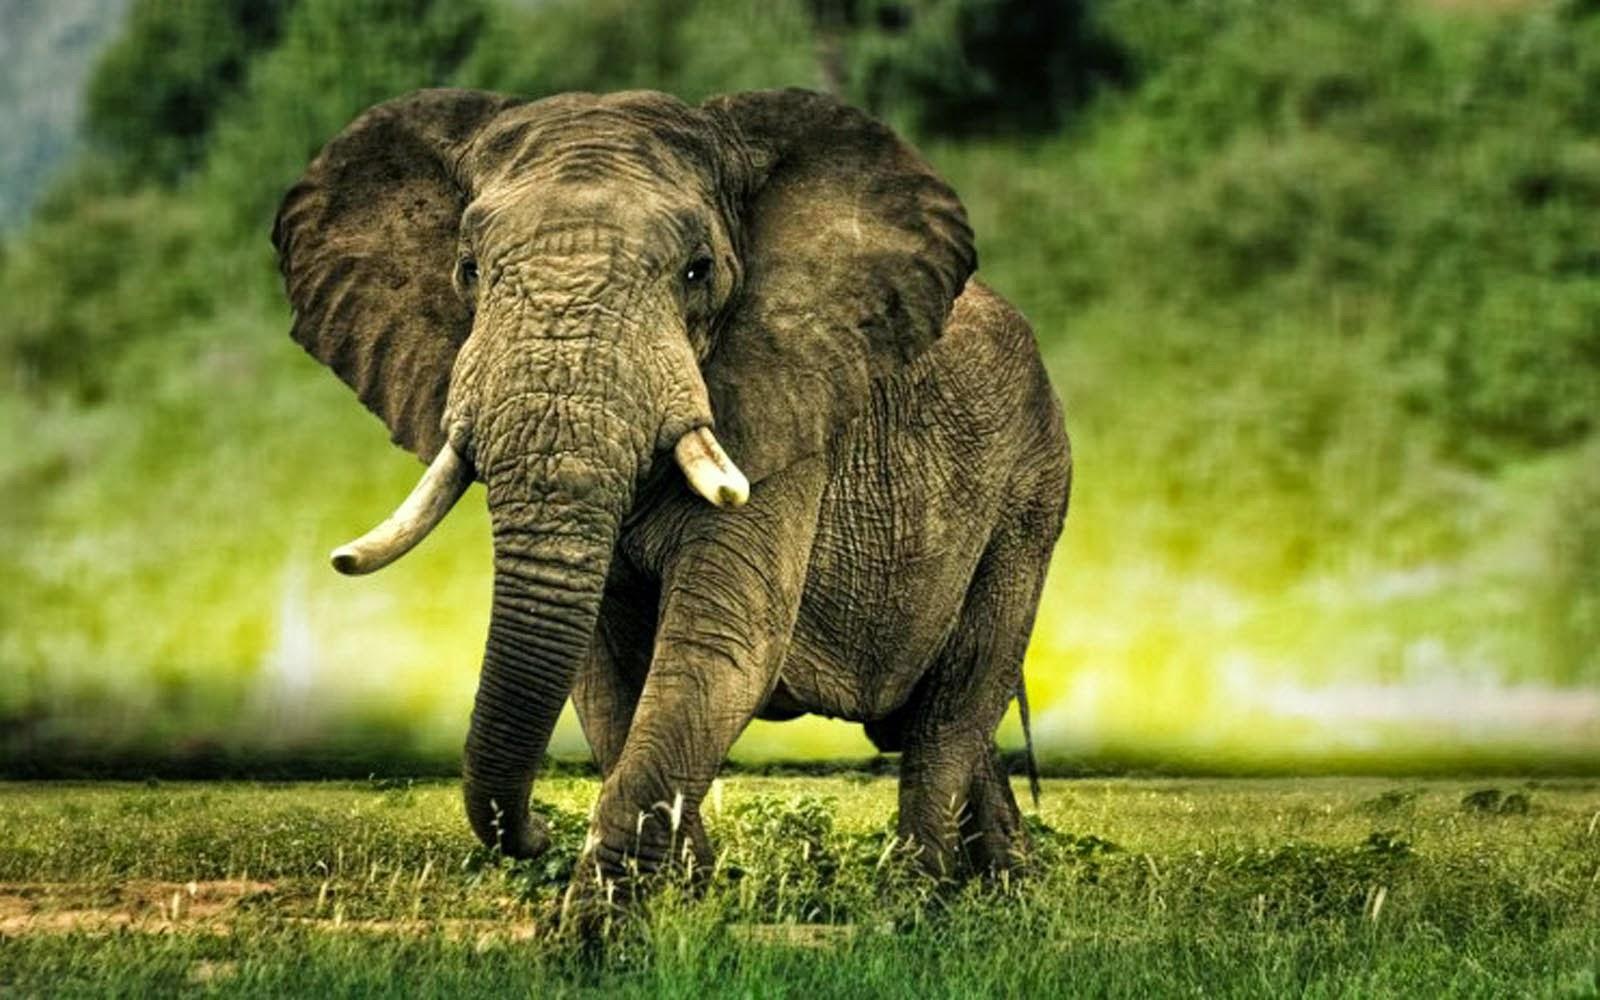 Elephant Hd Wallpapers Animals World